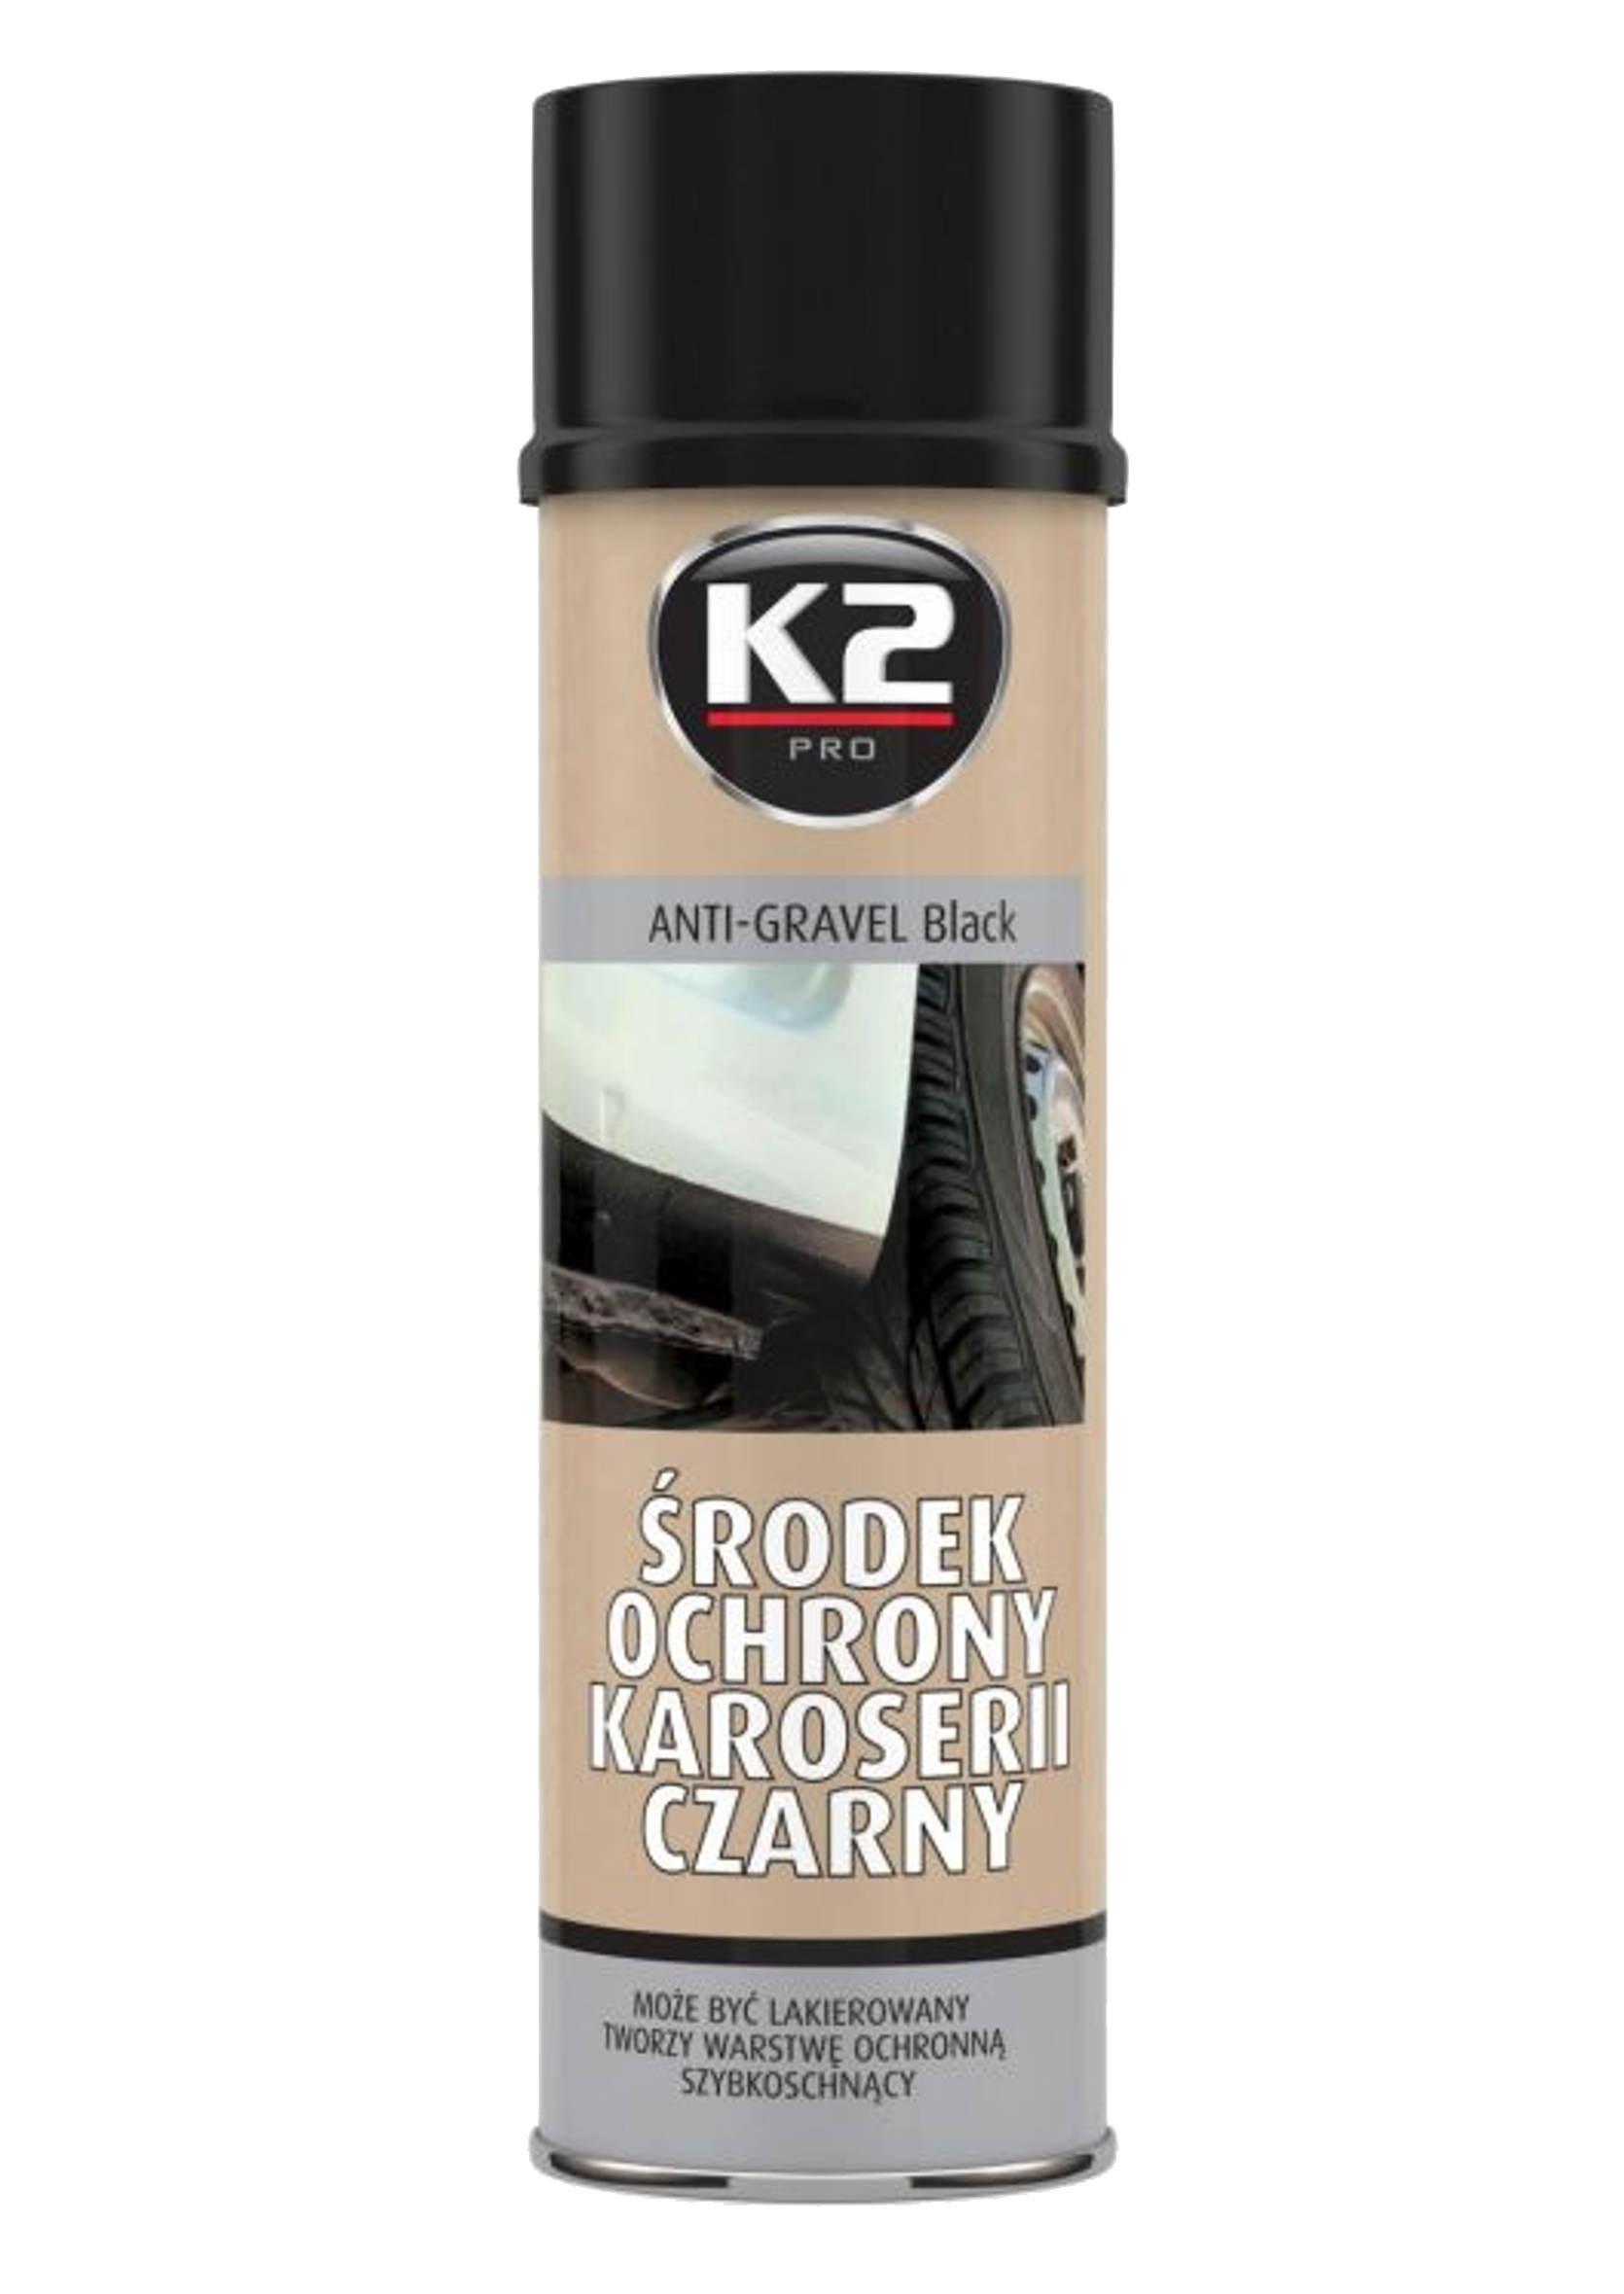 K2 Baranek Czarny 500 ml do Ochrony Karoserii